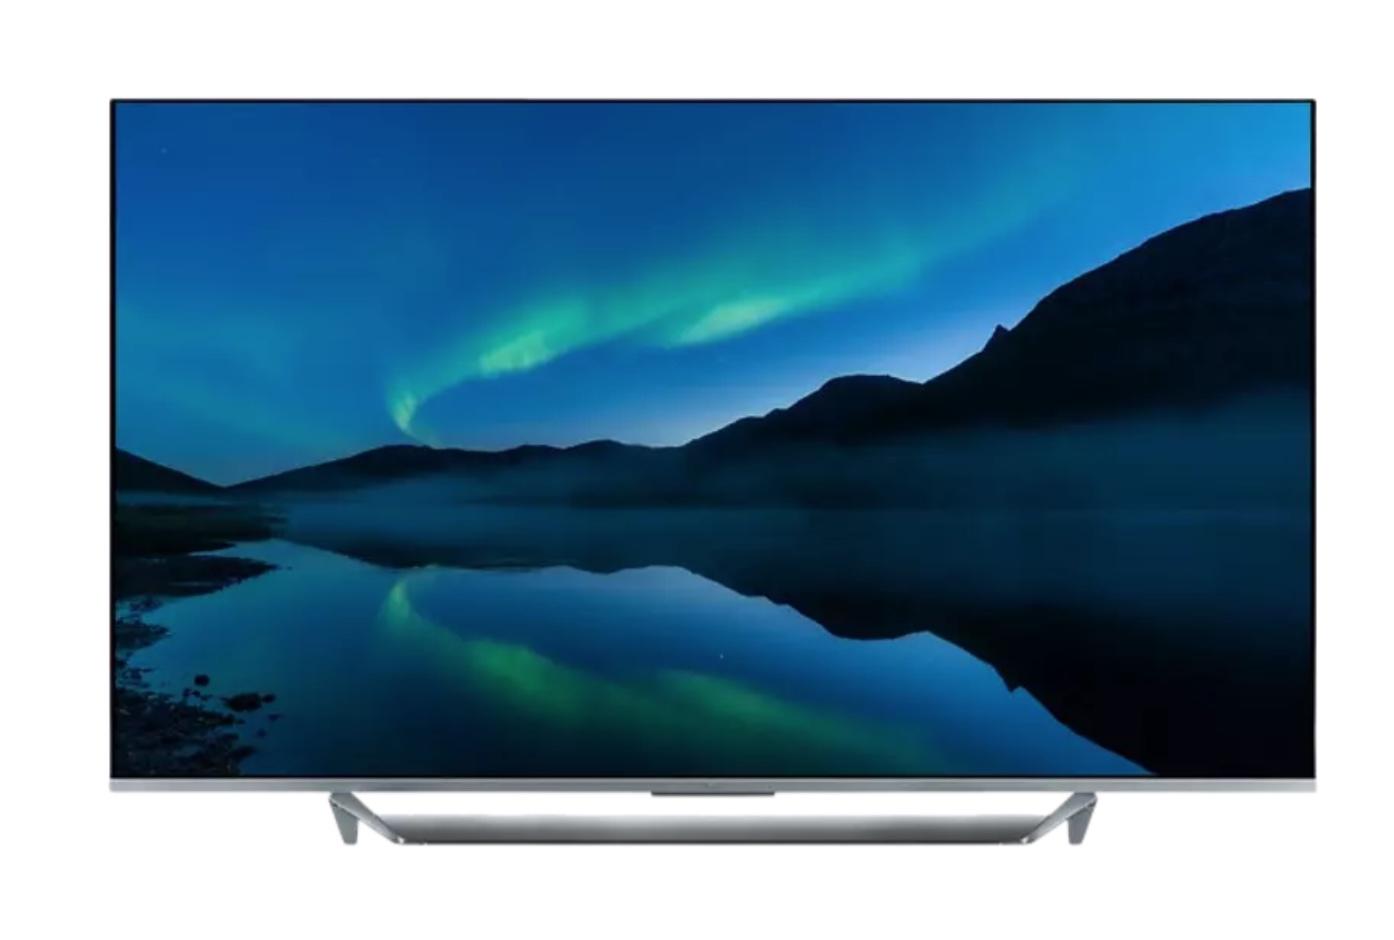 "TV QLED 75"" - Xiaomi Mi TV Q1, UHD 4K, MediaTek MT9611, Smart TV, DVB-T2, HDR10+, Dolby Vision, Negro"